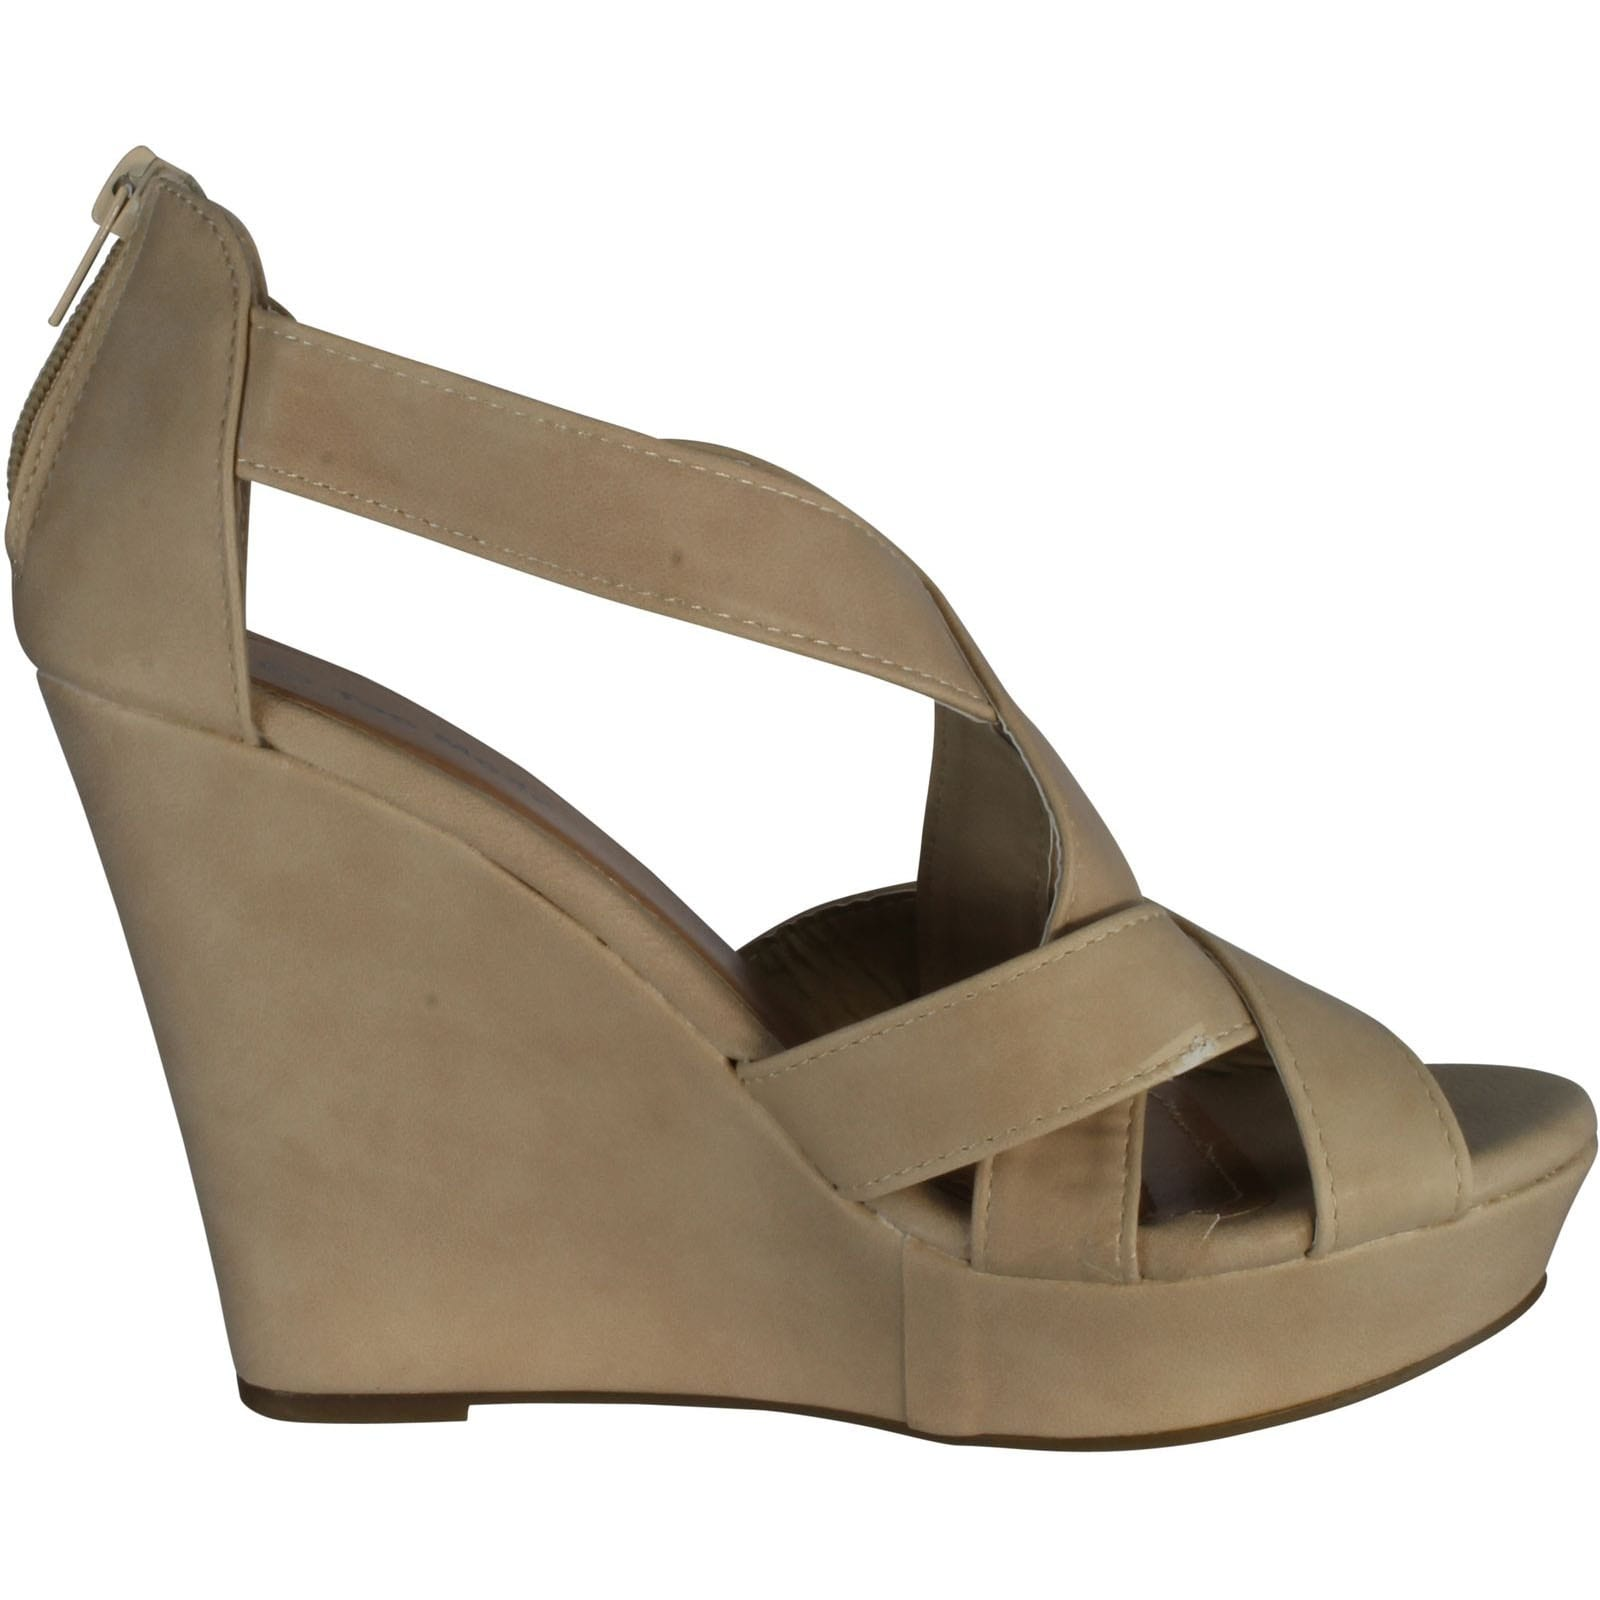 bafdd4c8c1bb Shop Top Moda Ella-18 Womens Gladiator Wedge Heel Sandals - Free Shipping  On Orders Over  45 - Overstock - 14312377